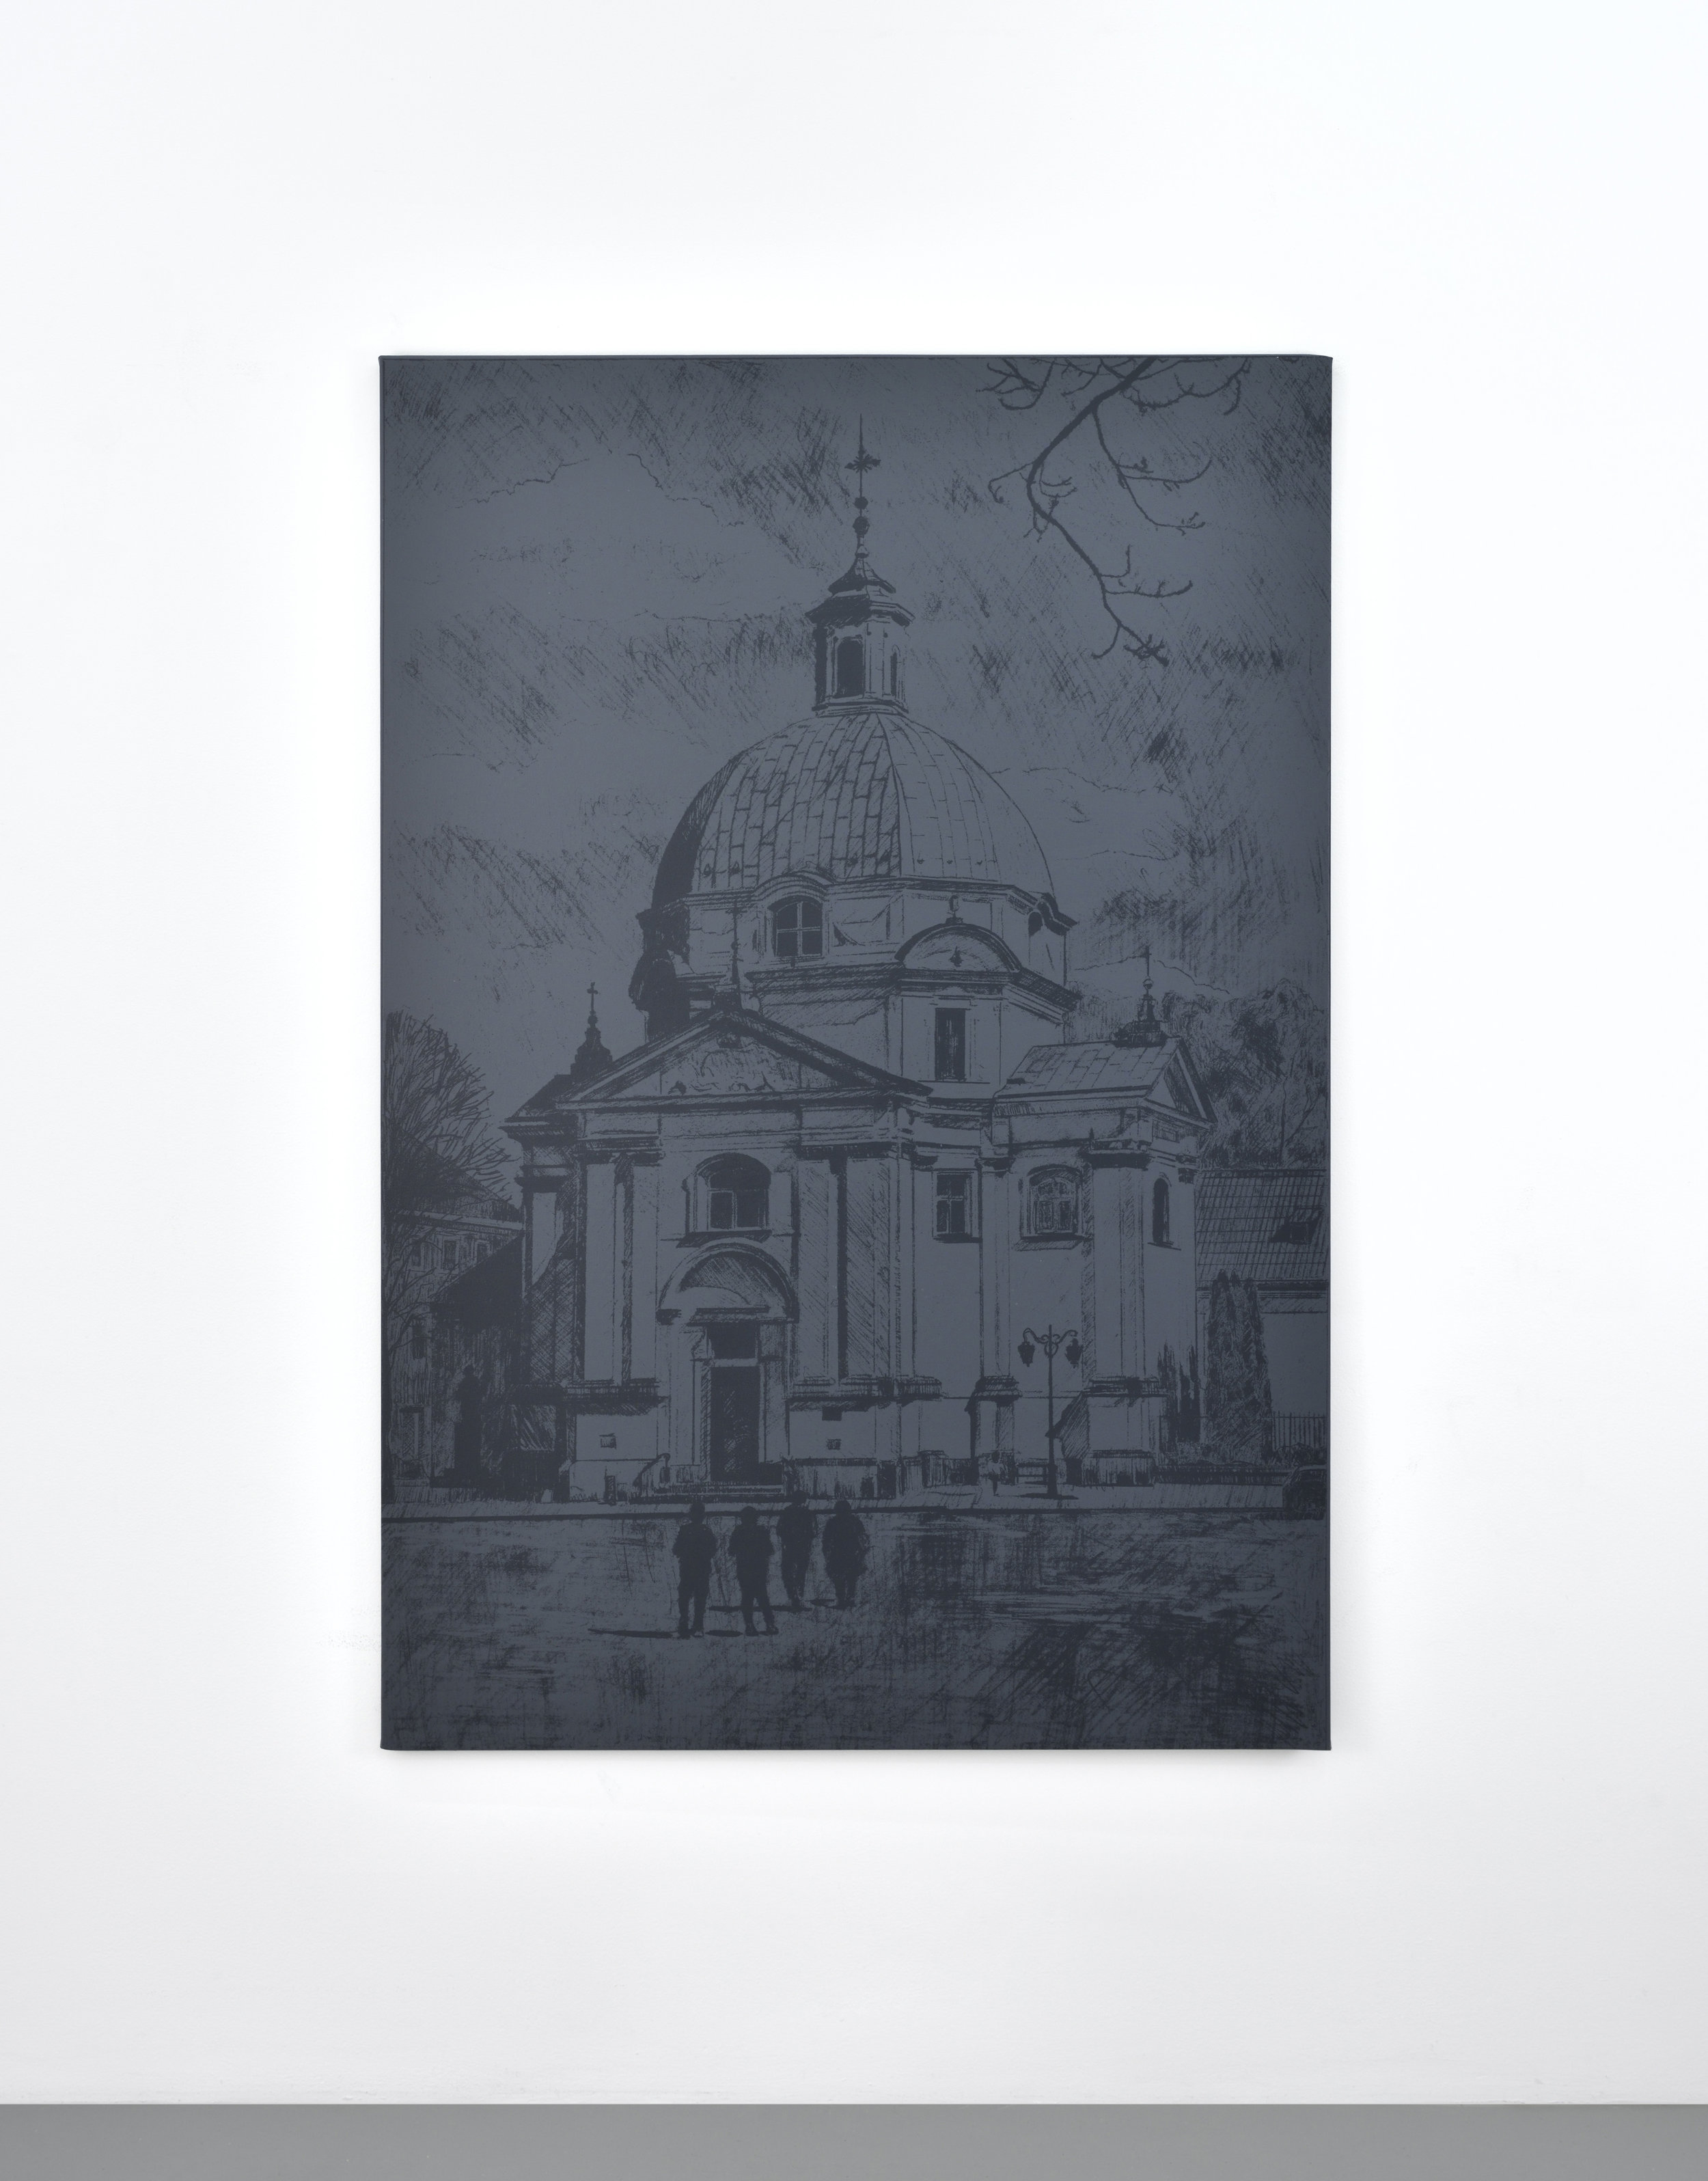 Untitled (church), 2017 silkscreen on canvas 159 x 106,7 cm - 62 5/8 x 42 inches